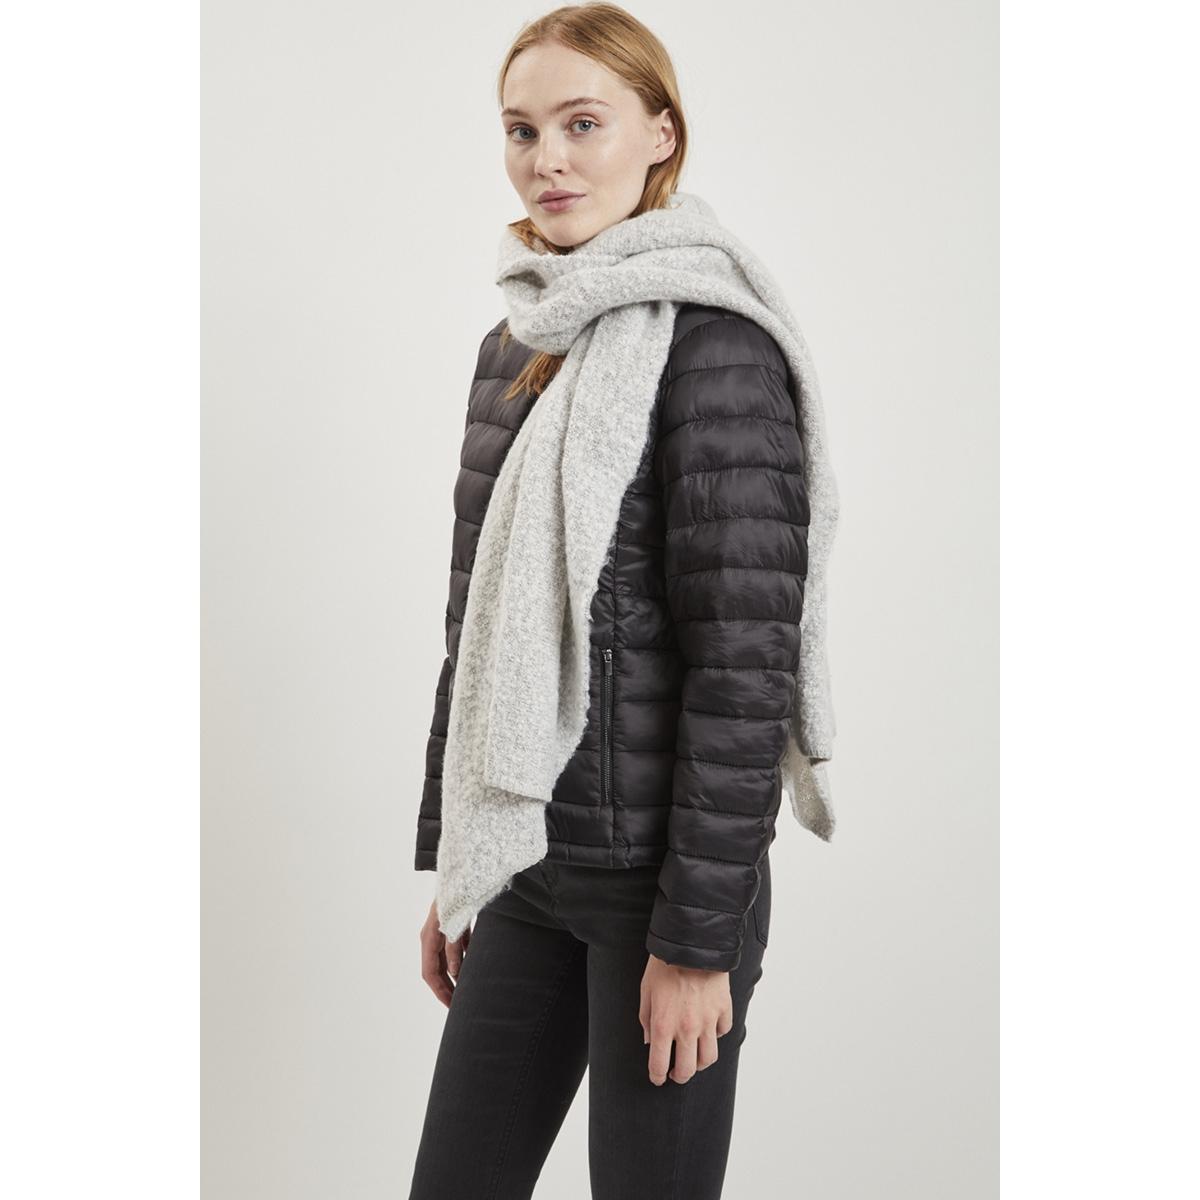 vitobi knit scarf-noos 14047111 vila sjaal light grey melange